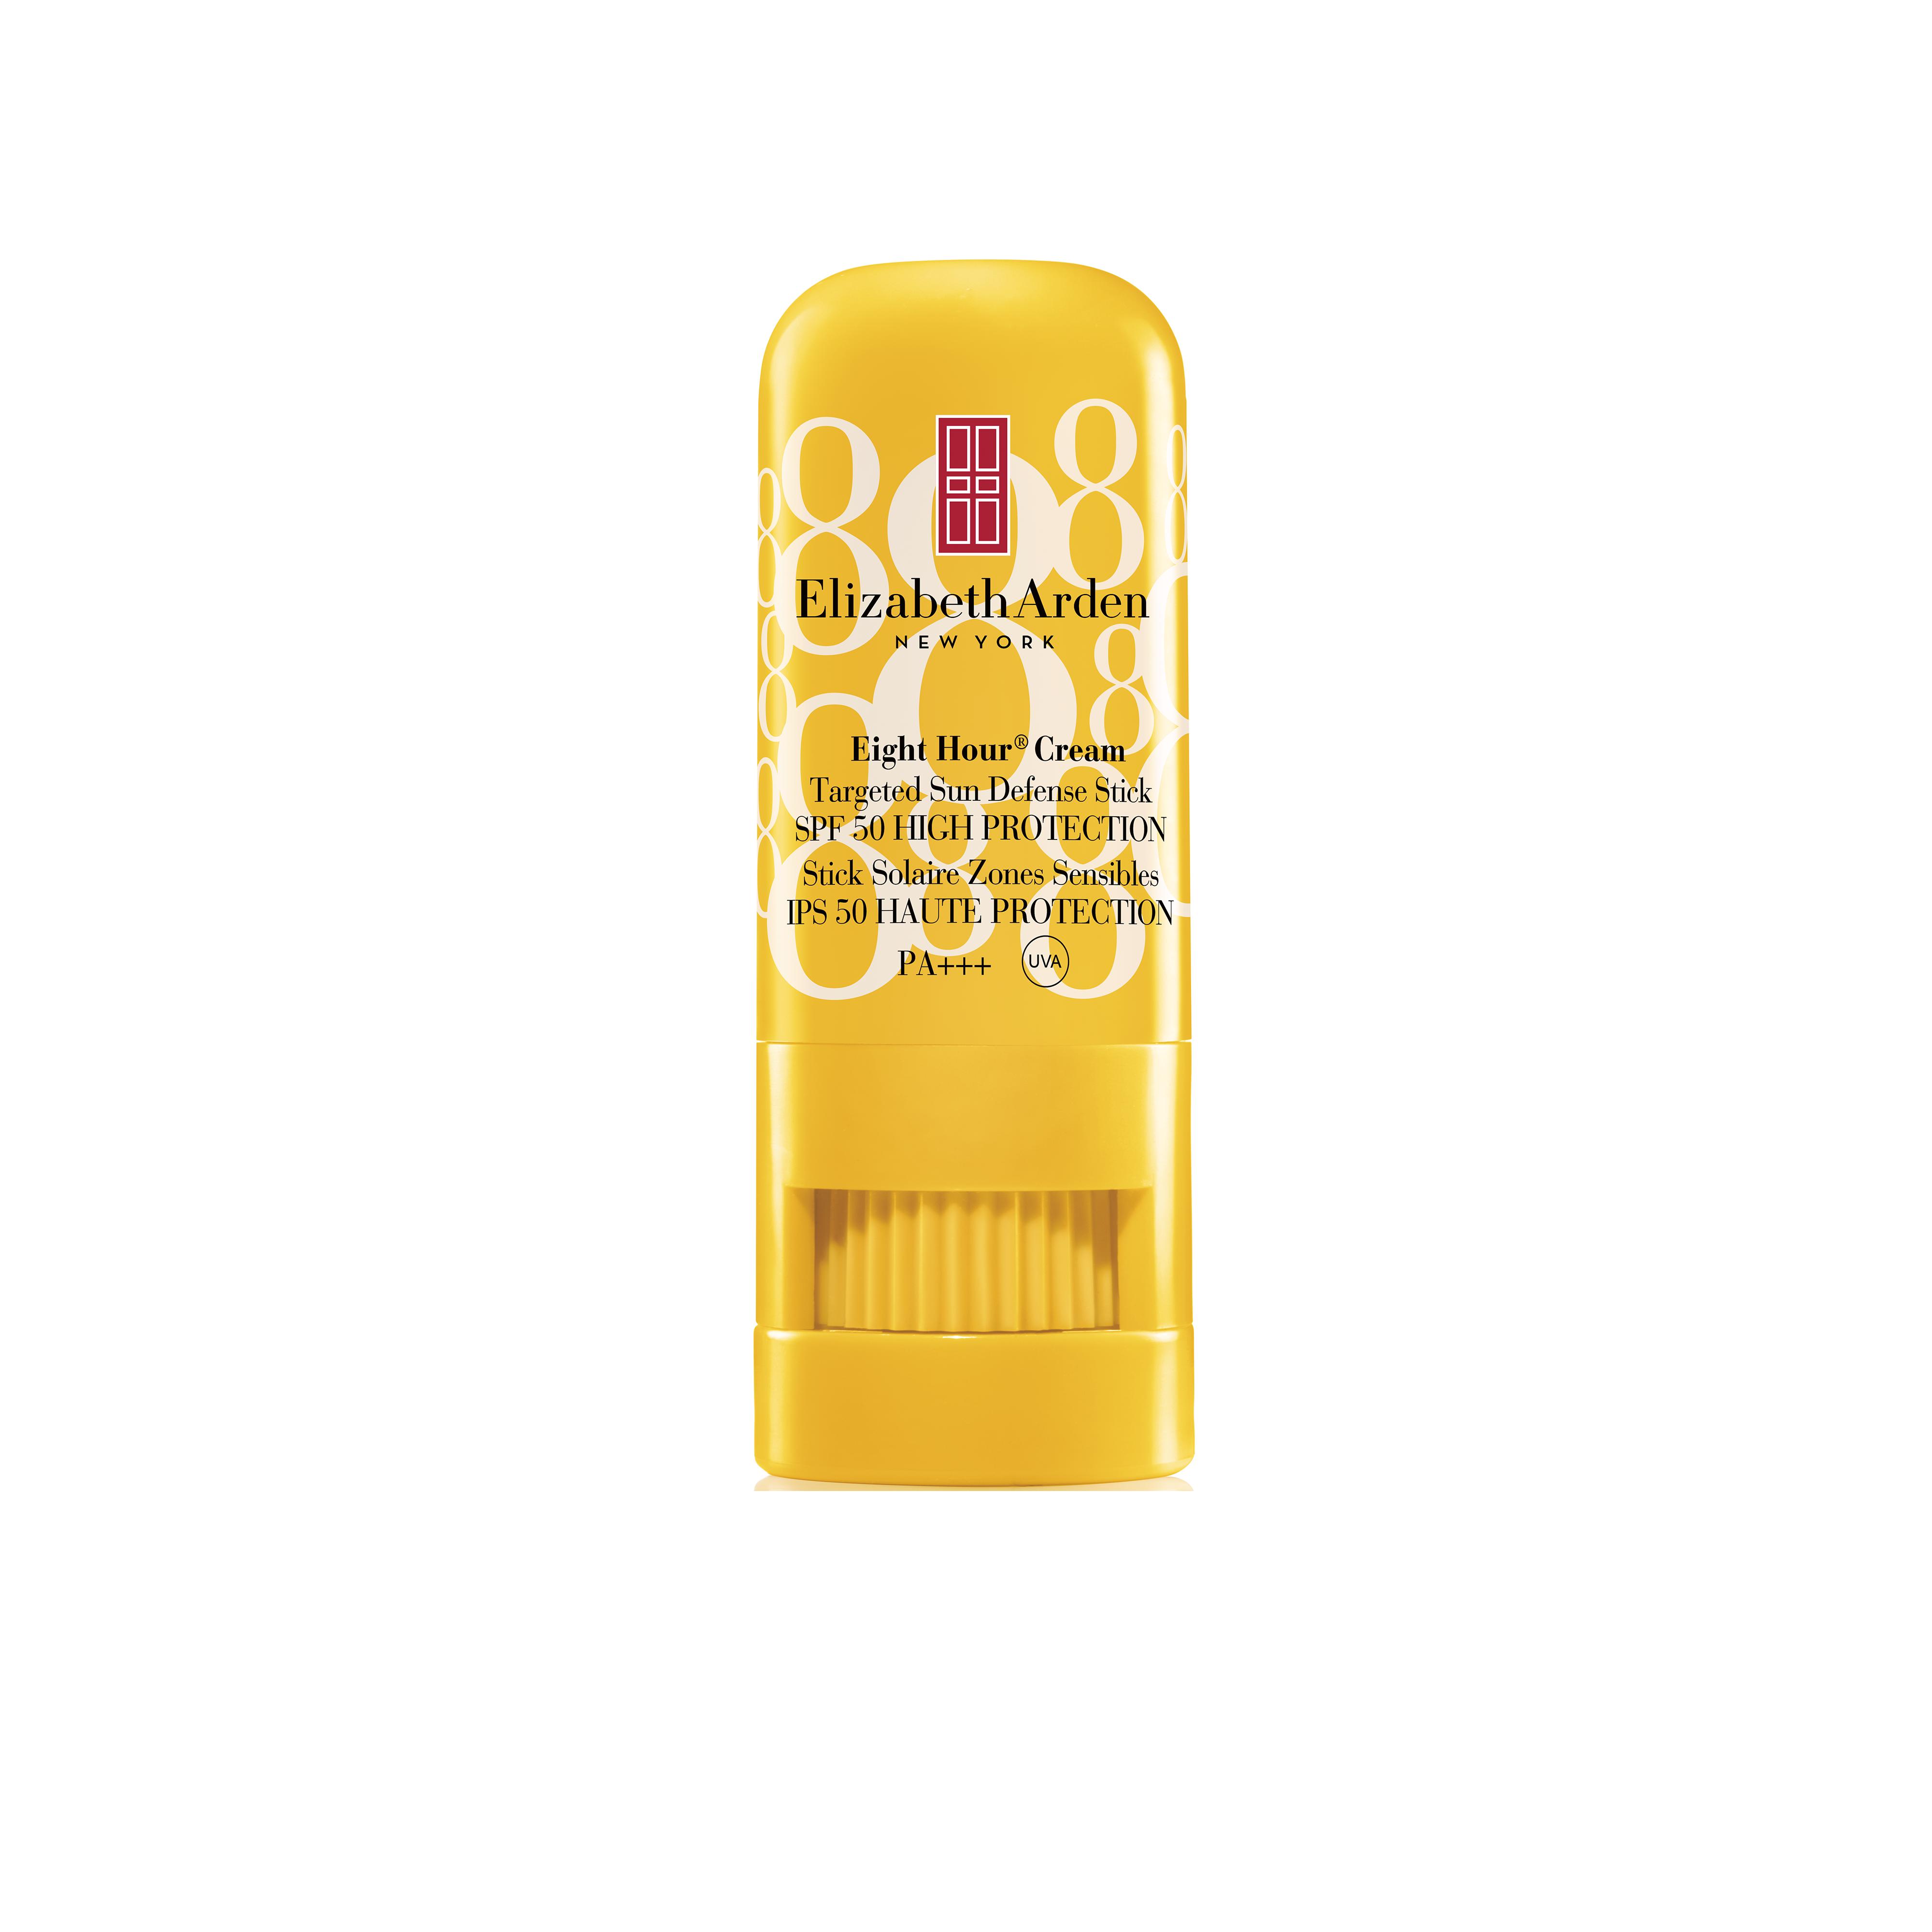 Eight Hour Cream Targeted Sun Defense Stick SPF 50